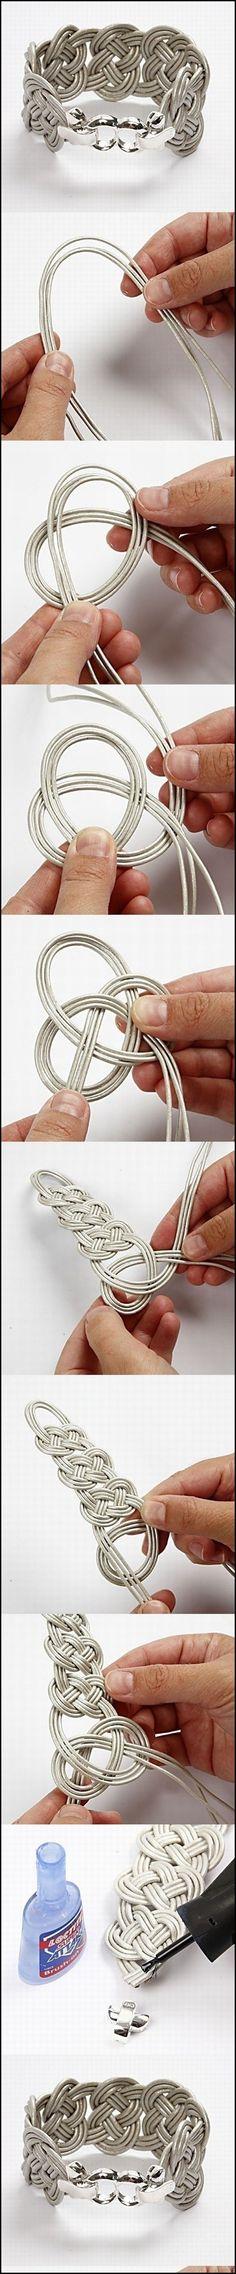 braid bracelet m Wonderful DIY cool bracelet